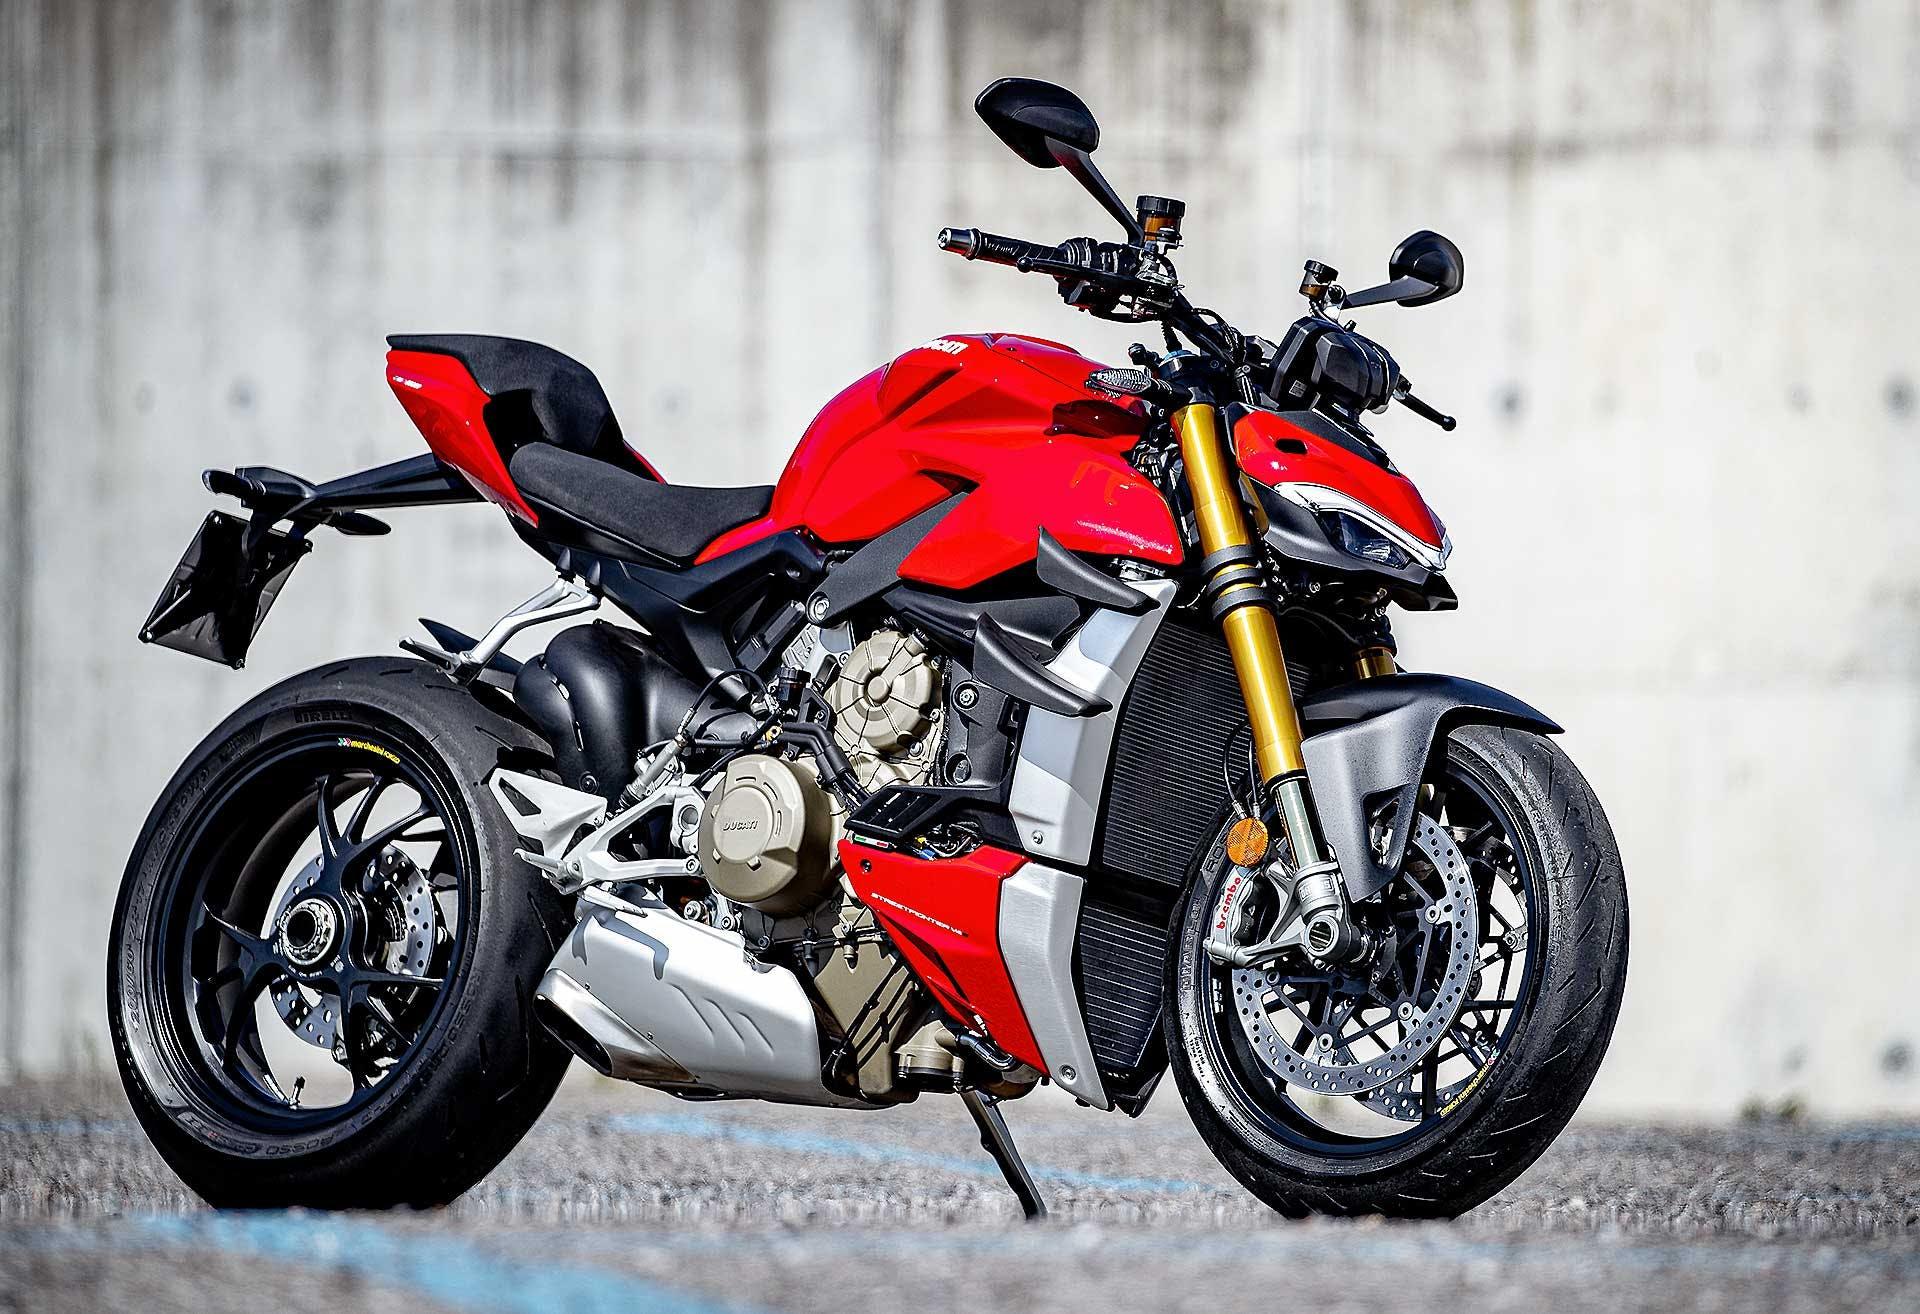 Ducati Streetfighter V4 S rossa